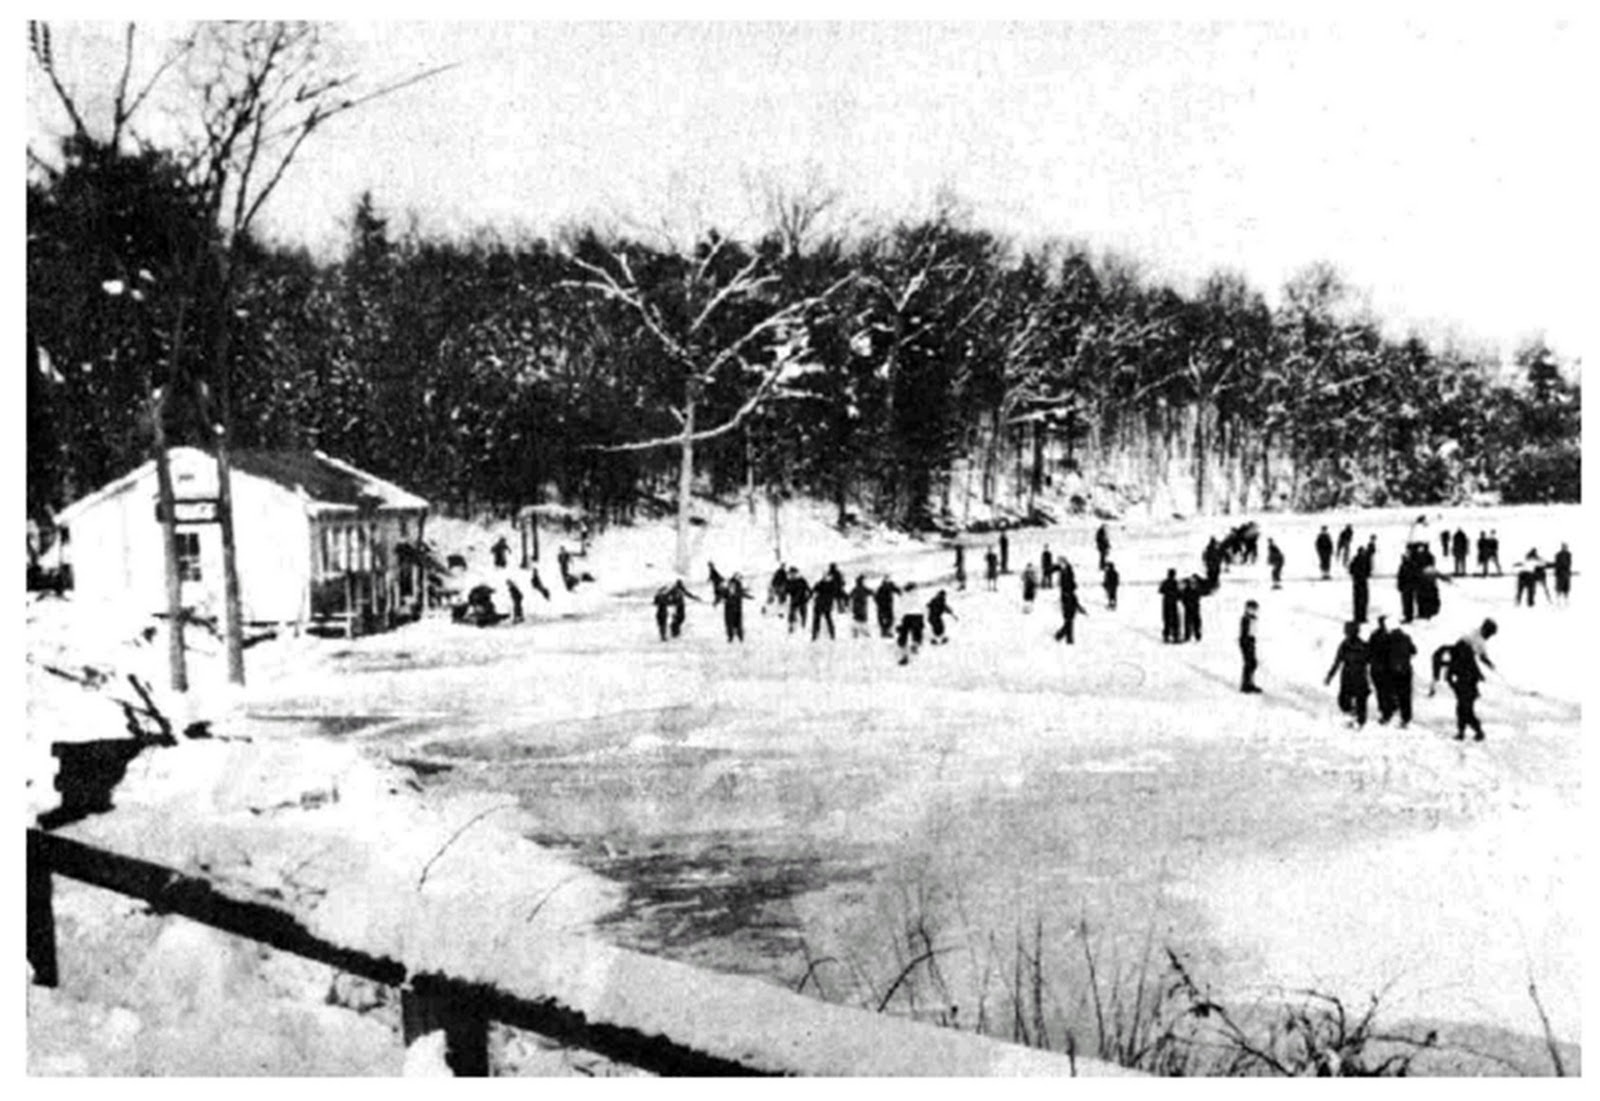 Pratt Farm Skating Pond, c1936, Massachusetts | Desperate ...